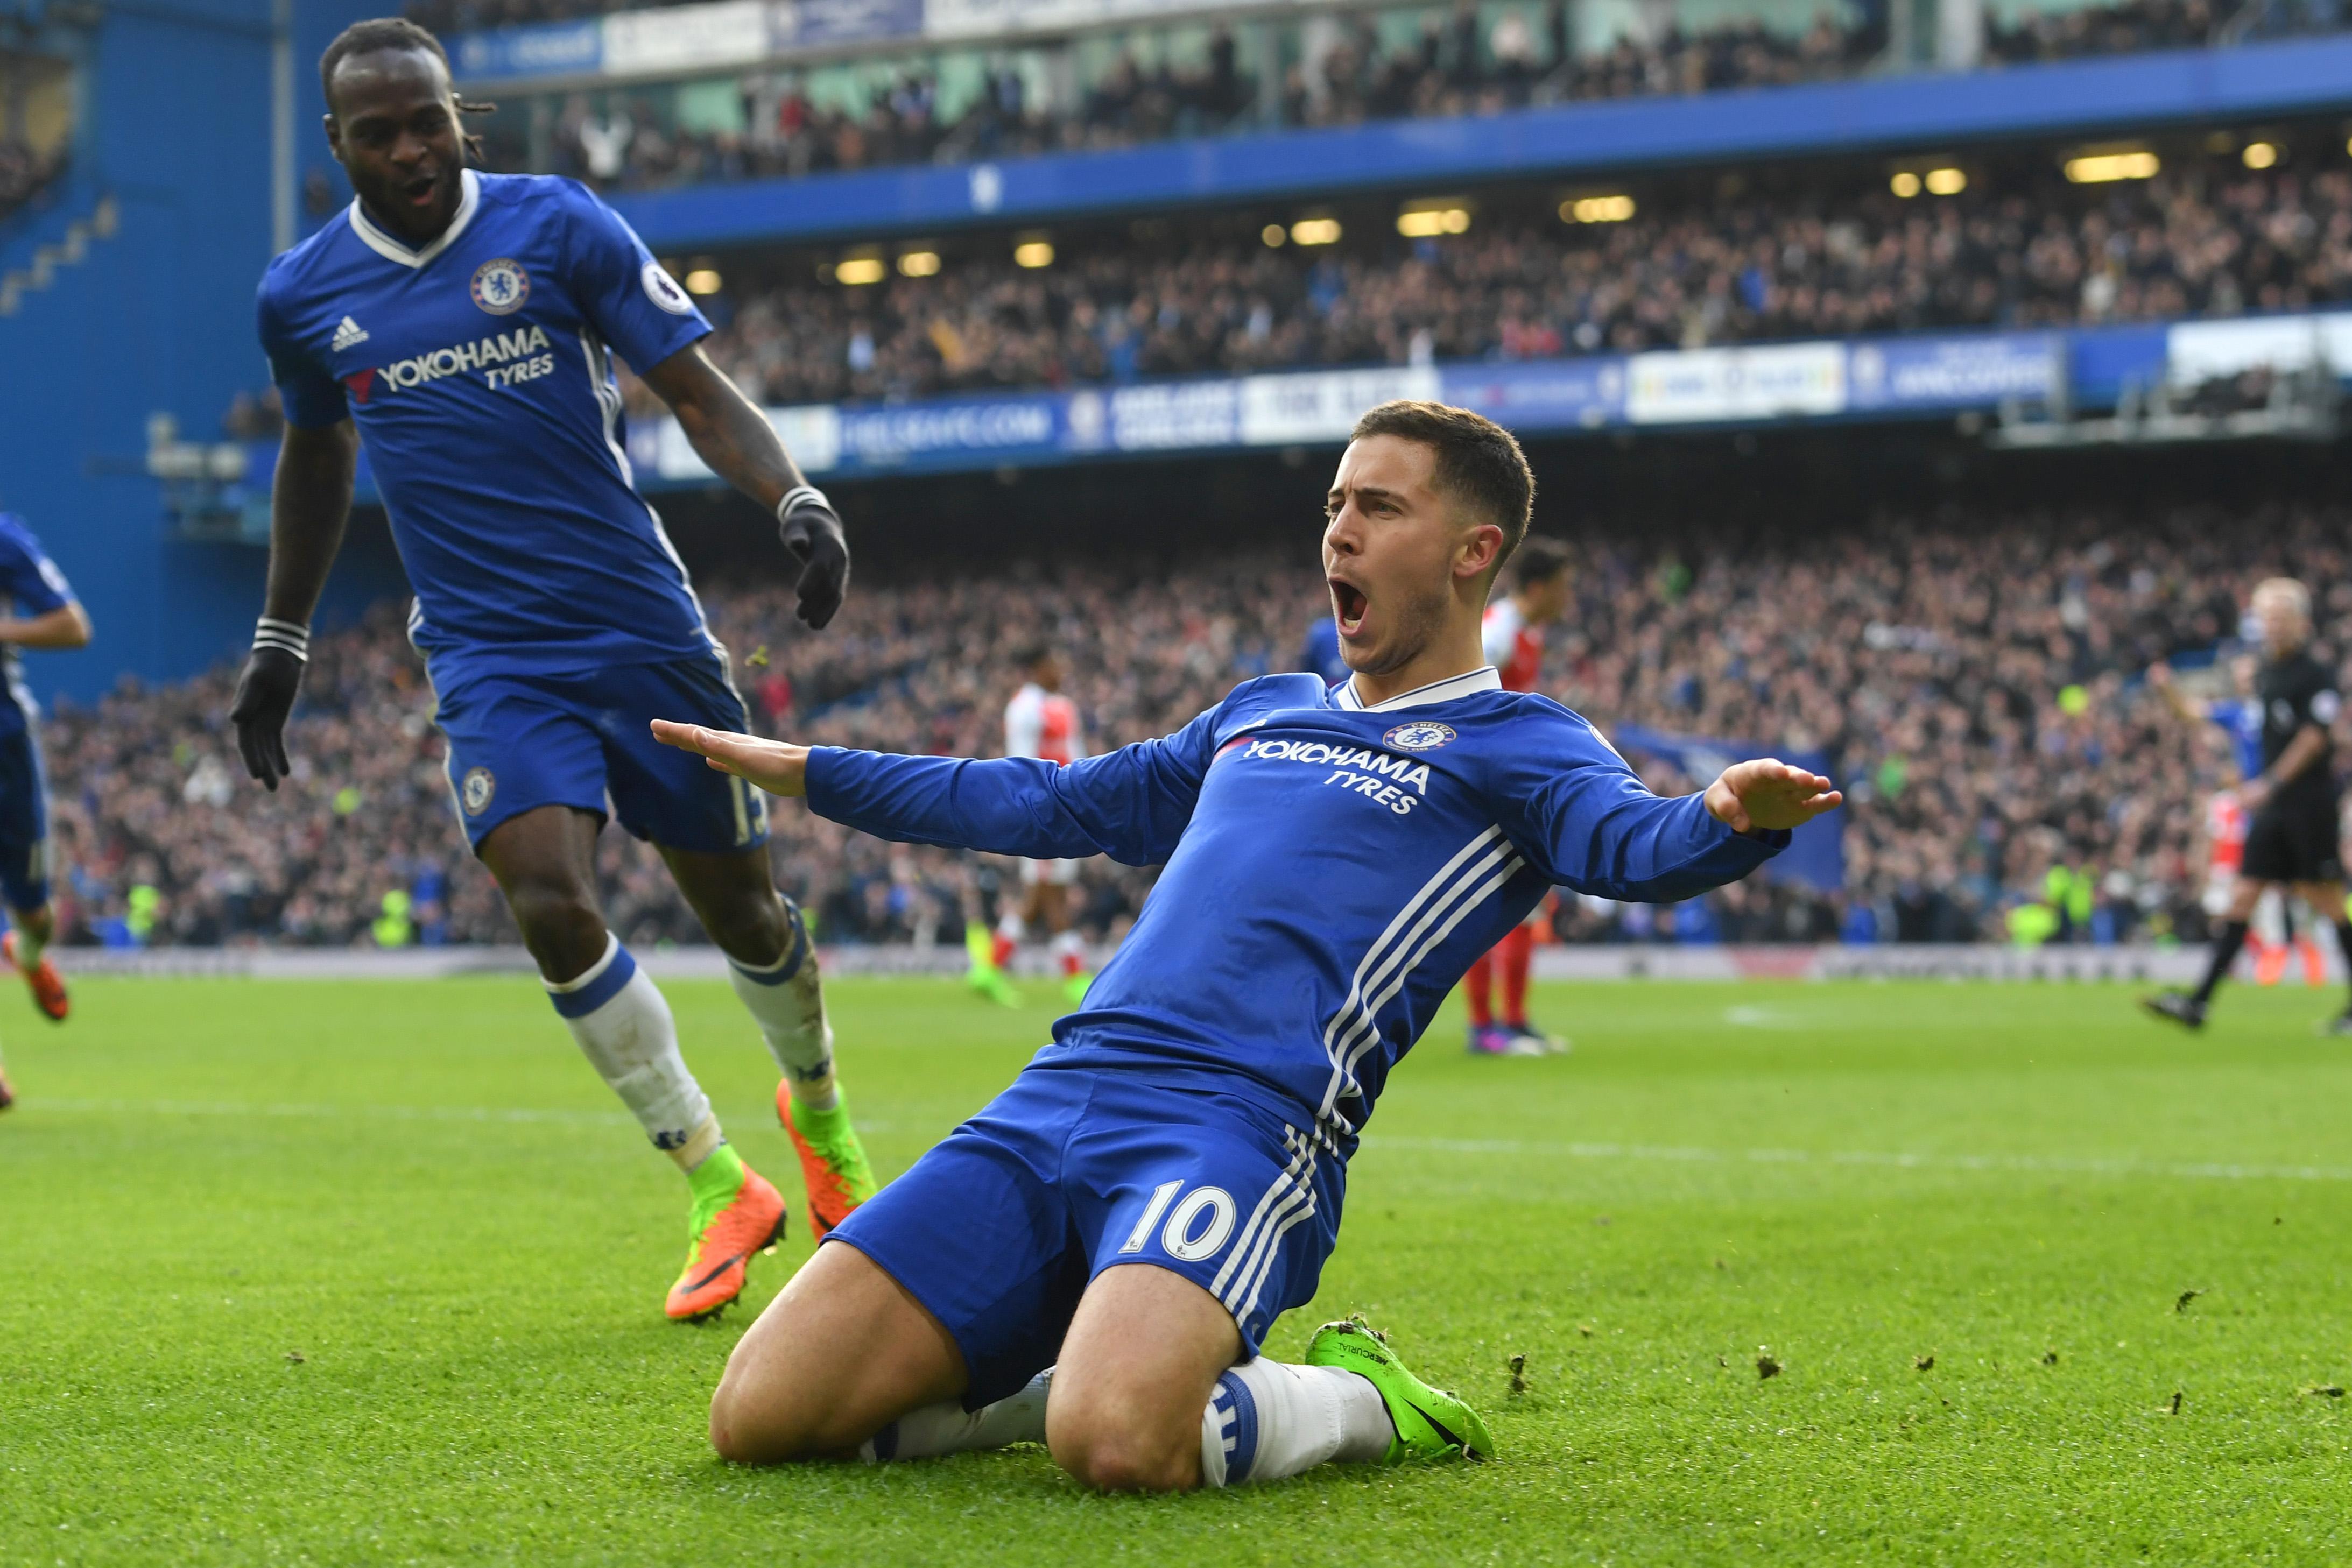 Premier league match of the week: Hazard shines as Chelsea extend lead